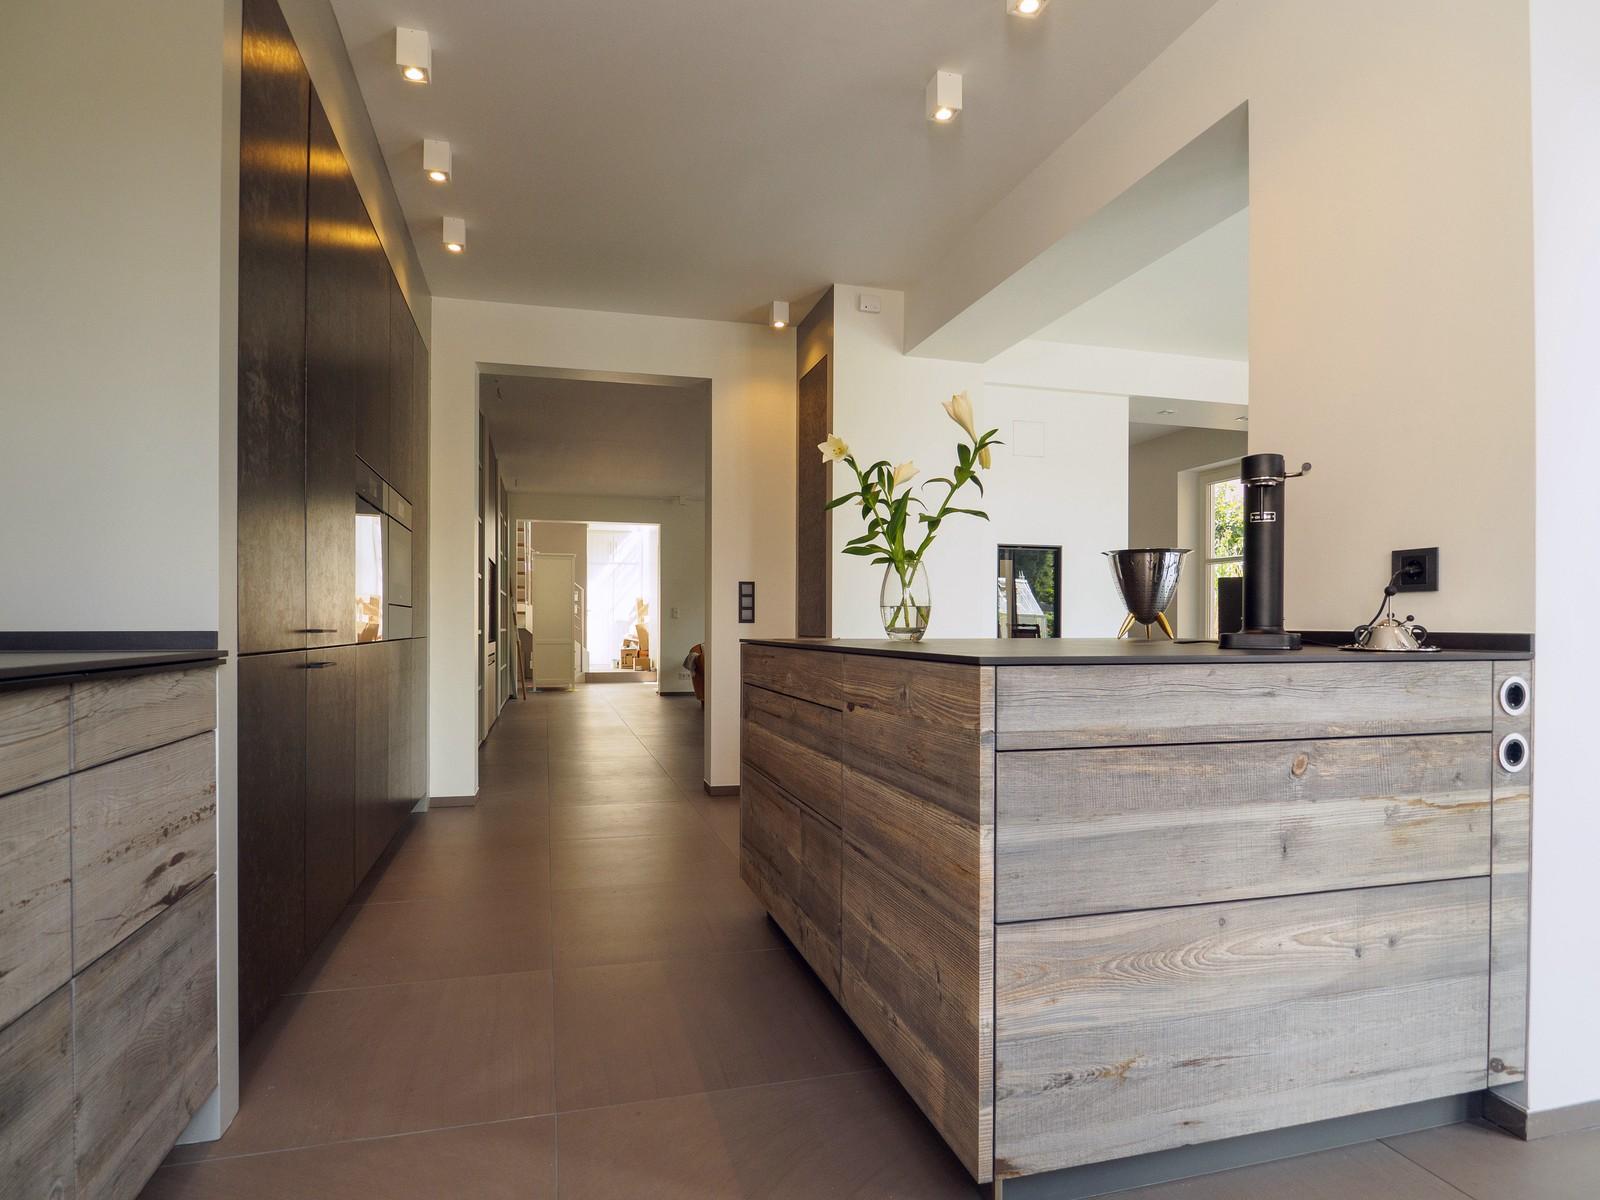 Kueche Exklusiv Design Fronten Holz Furnier Sonnenverbrannt Stahl Keramik Arbeitsplatte Miele 4